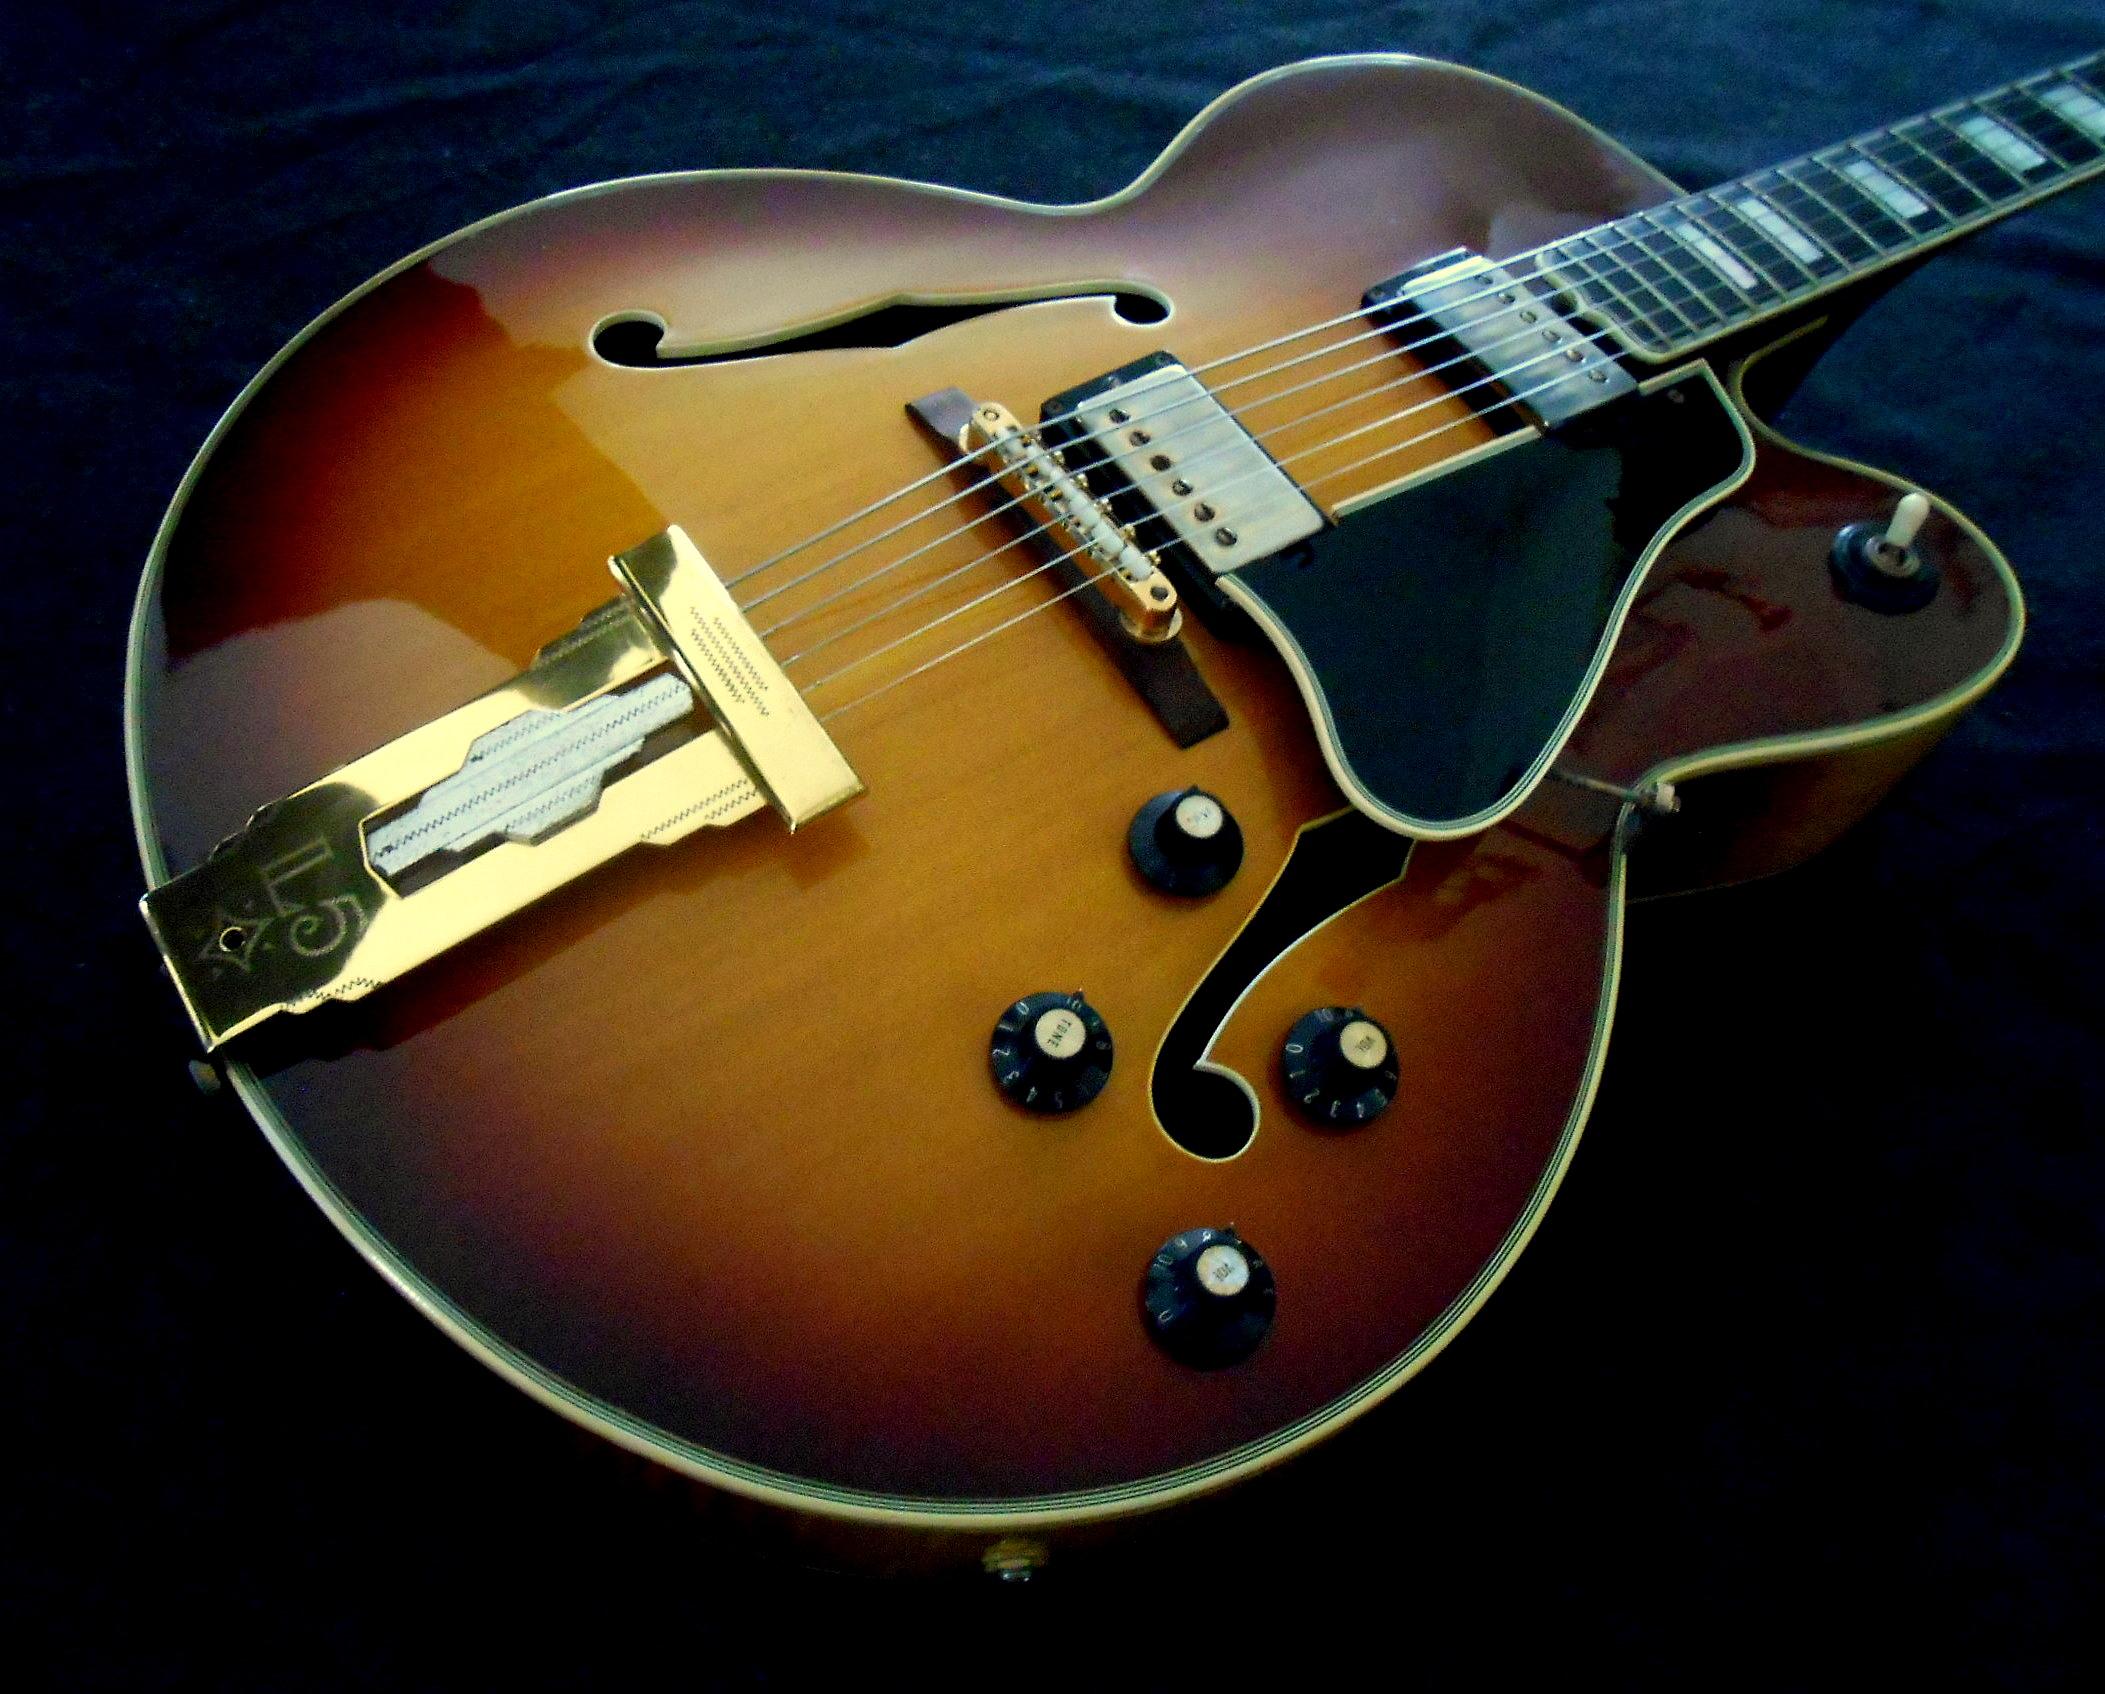 Home Design Pro Online Gibson L5 Ces Custom 1975 Image 716161 Audiofanzine